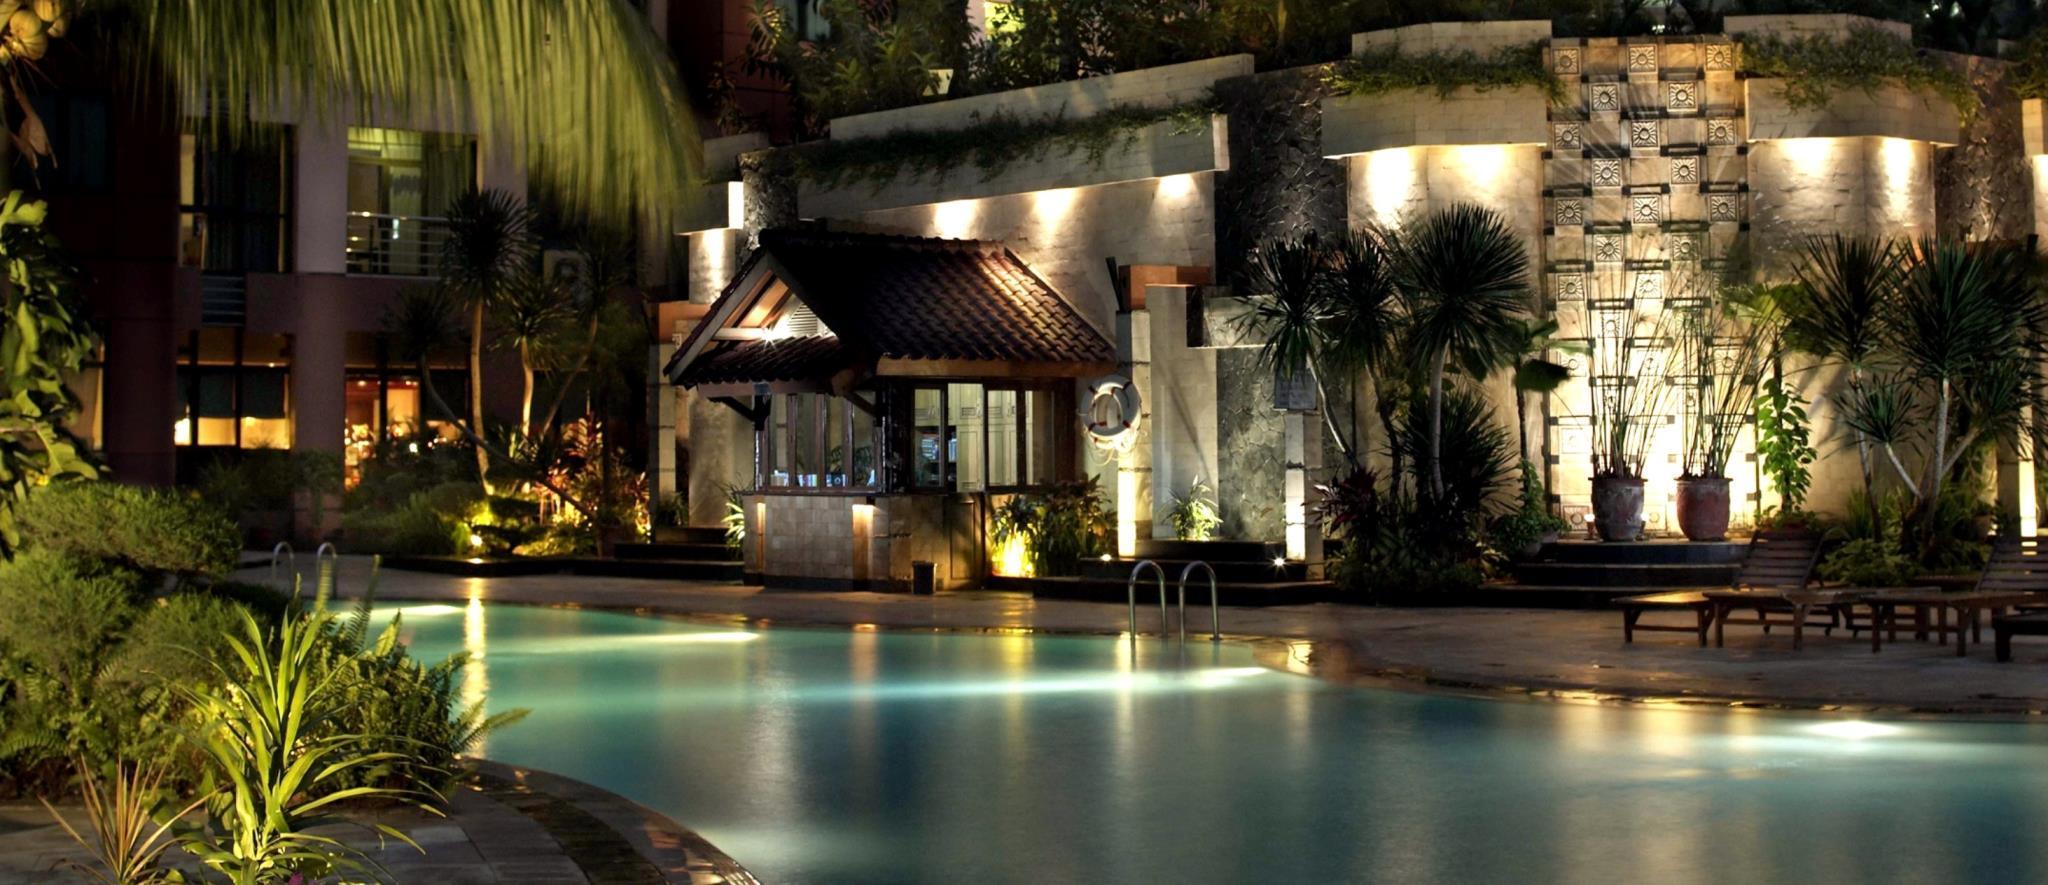 Kristal Hotel Jakarta In Indonesia